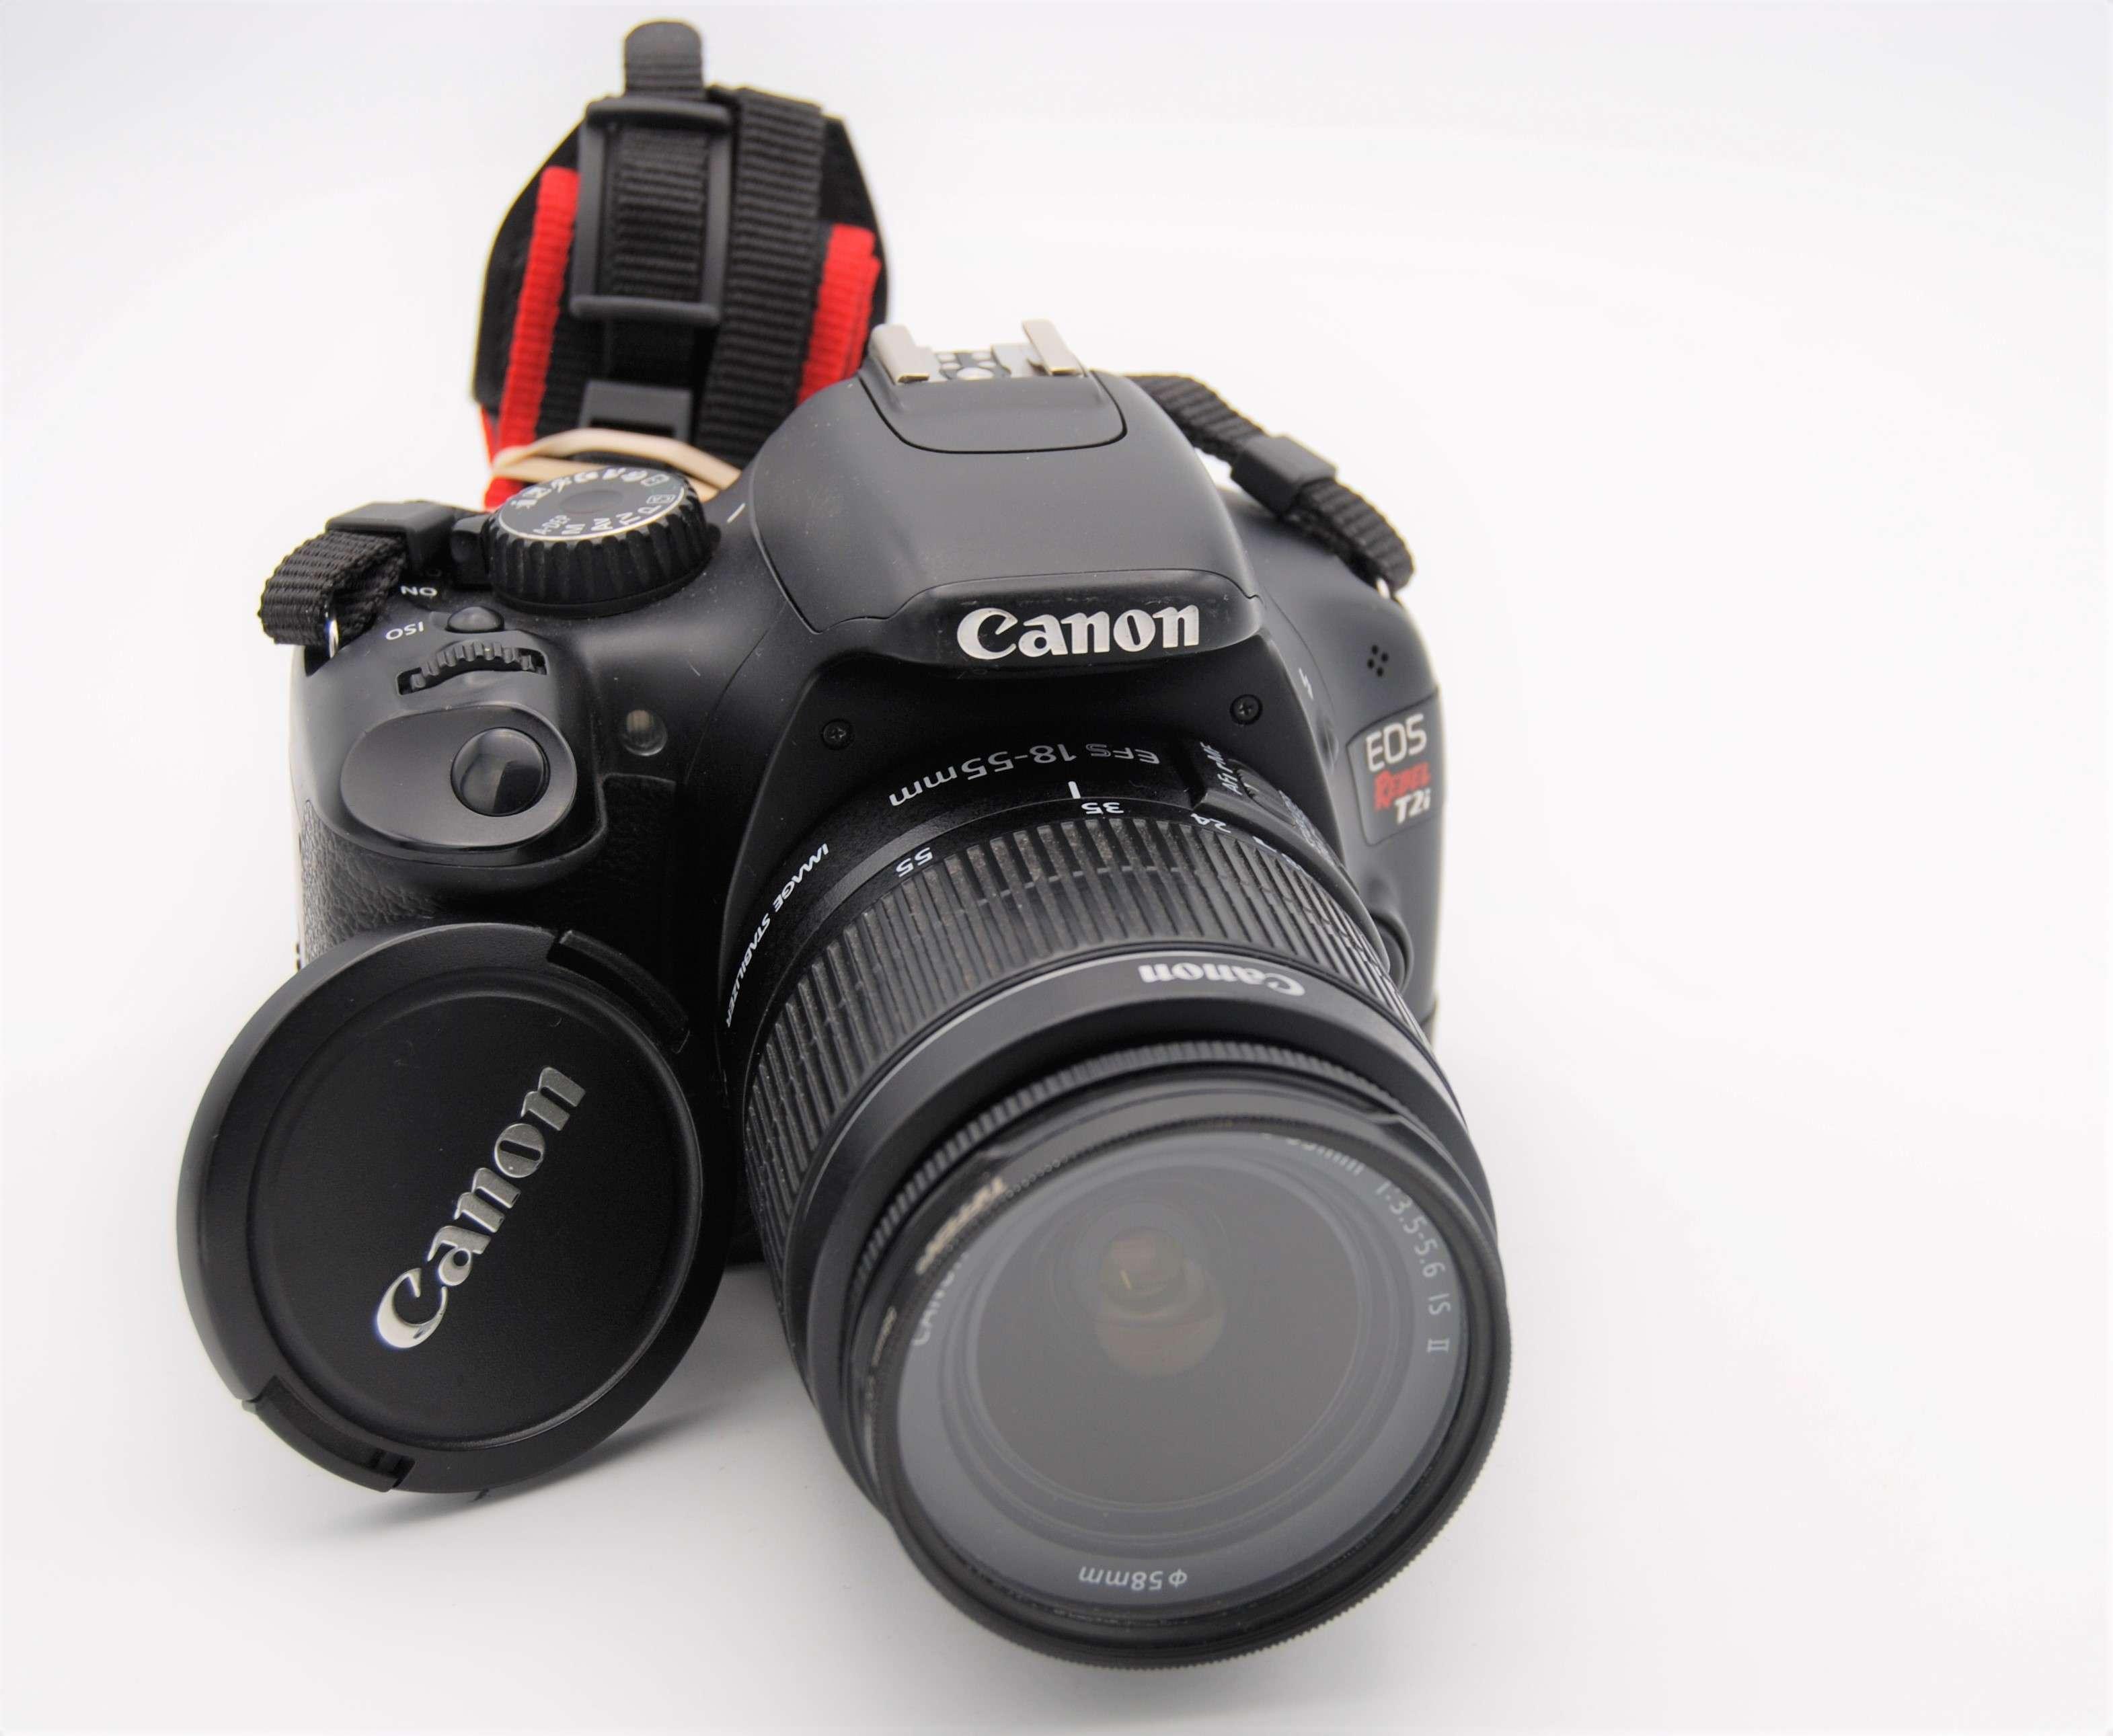 canon eos 550d rebel t2i kiss x4 18mp dslr camera w ef s 18 rh ebay com canon eos 550d instruction manual english canon eos 550d instruction manual